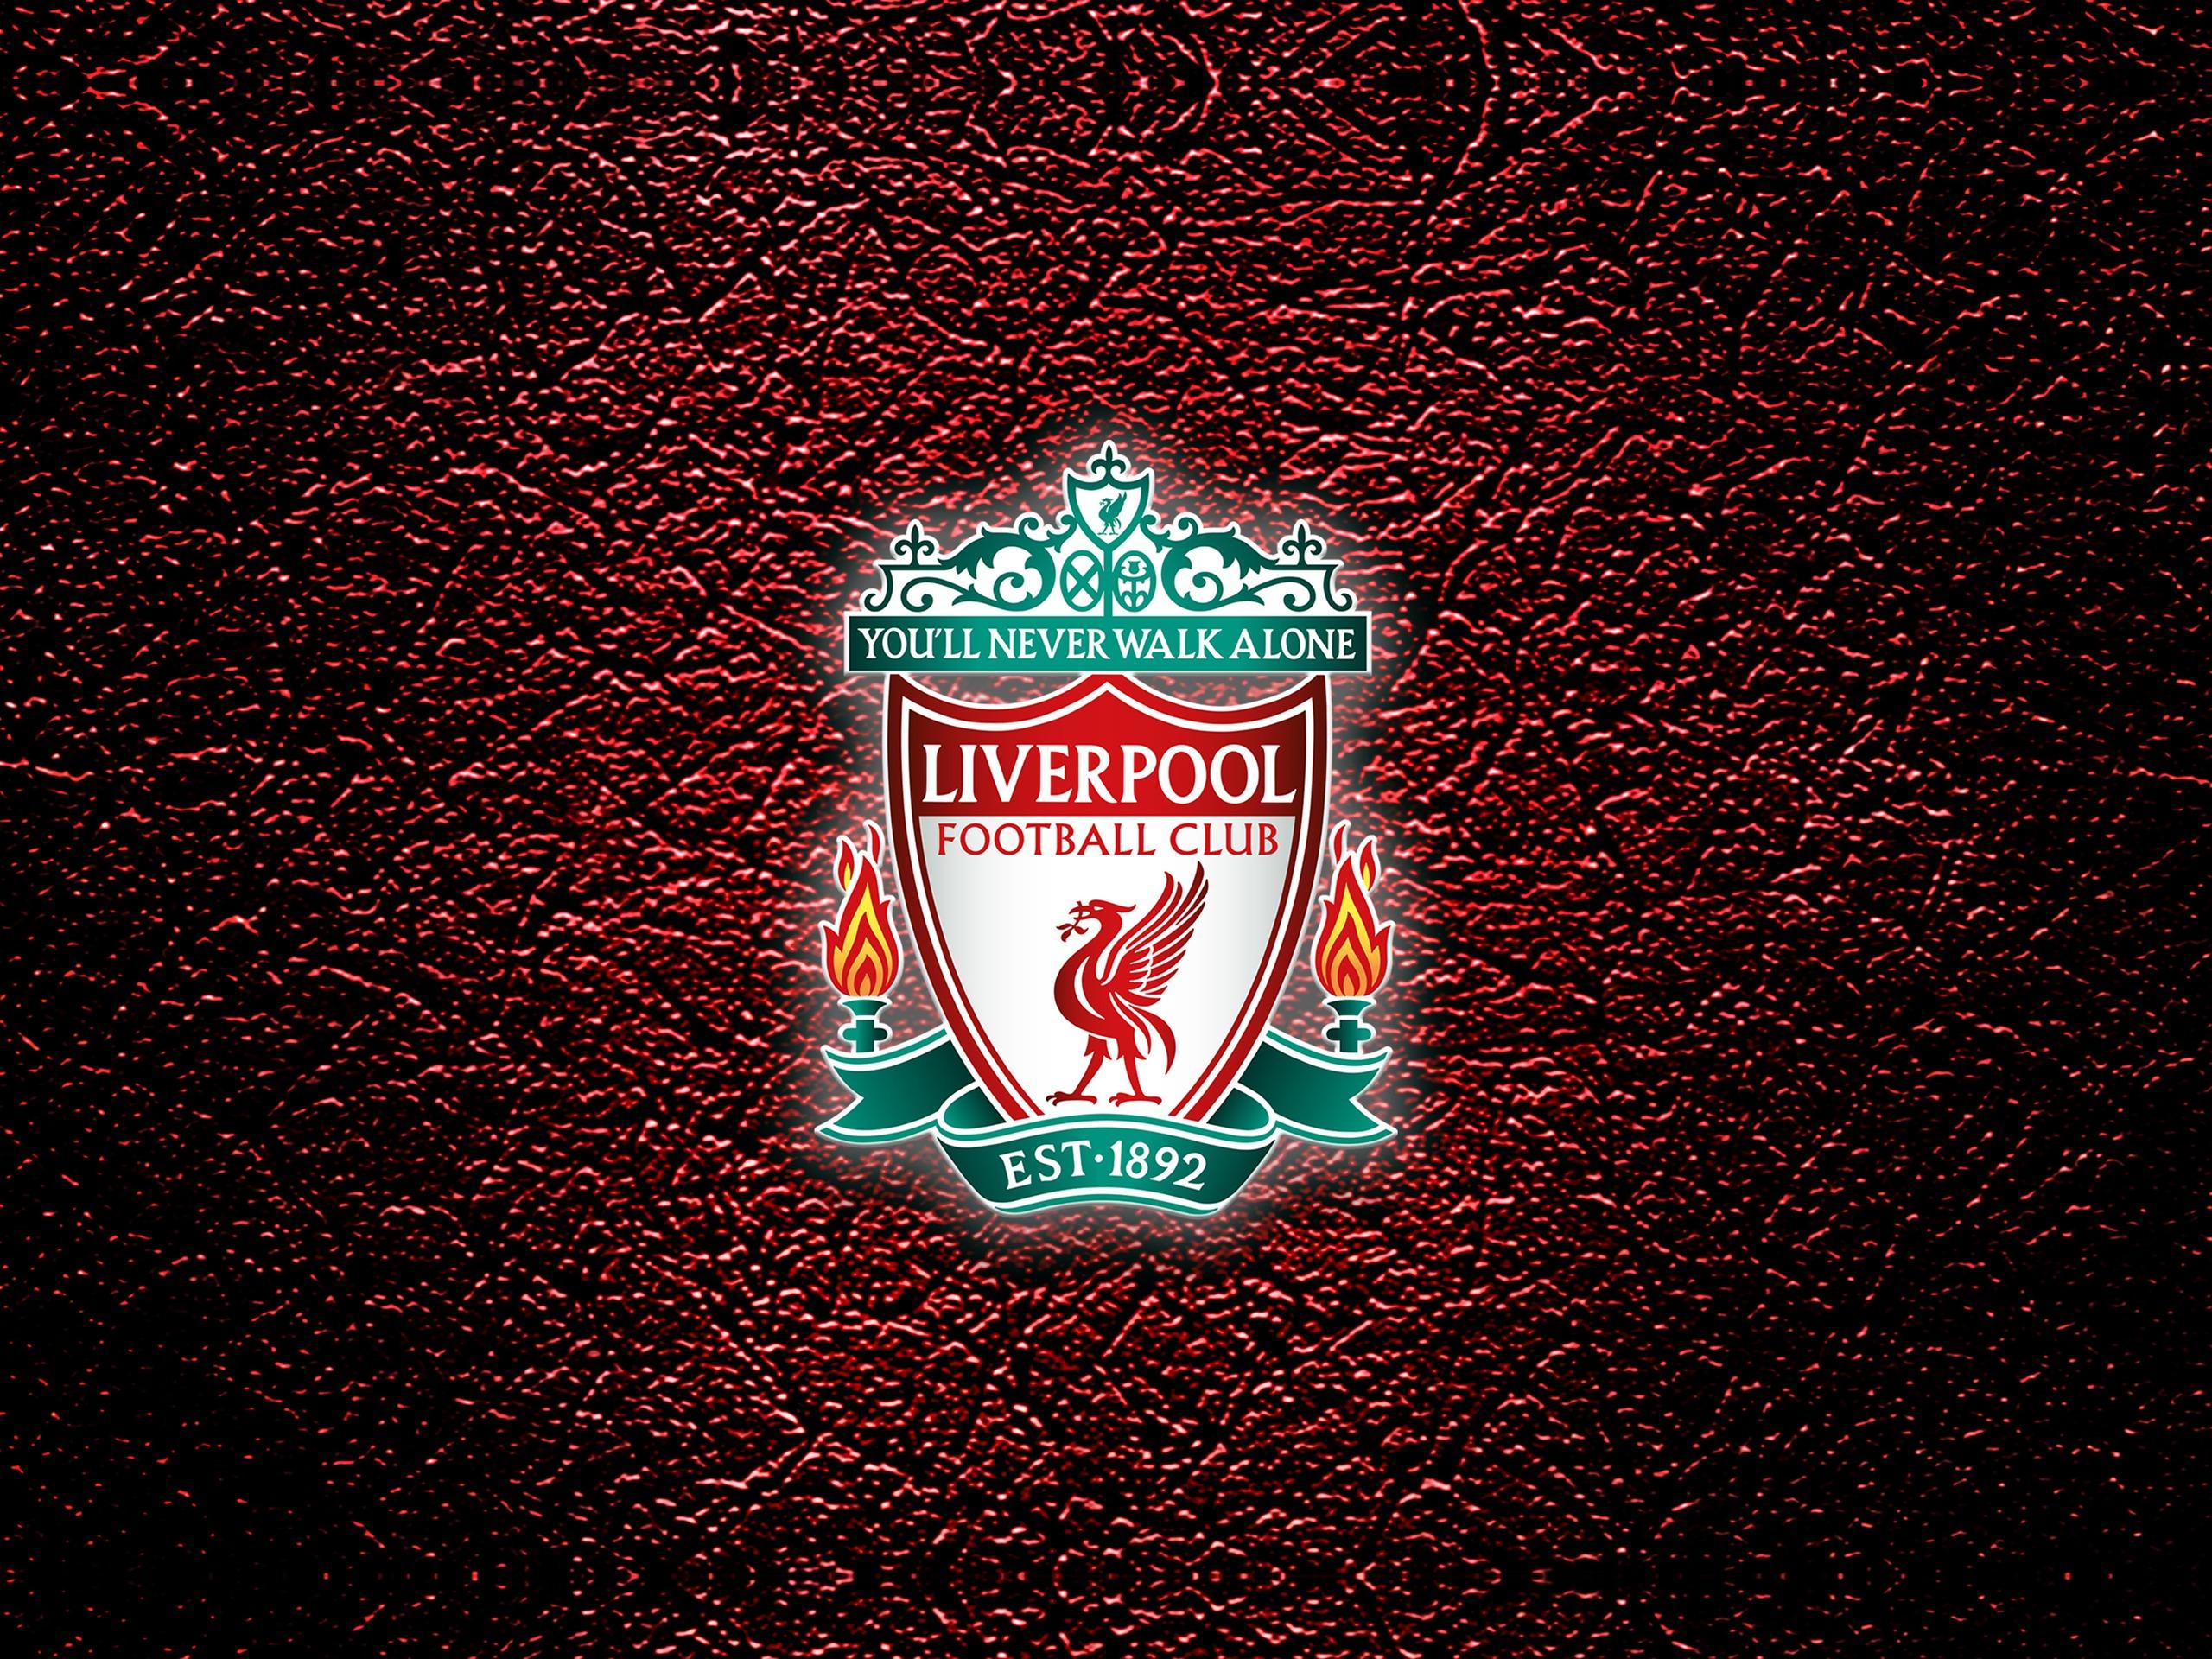 10wallpaper.com 利物浦,2018年,足球俱乐部,标志,设计预览  